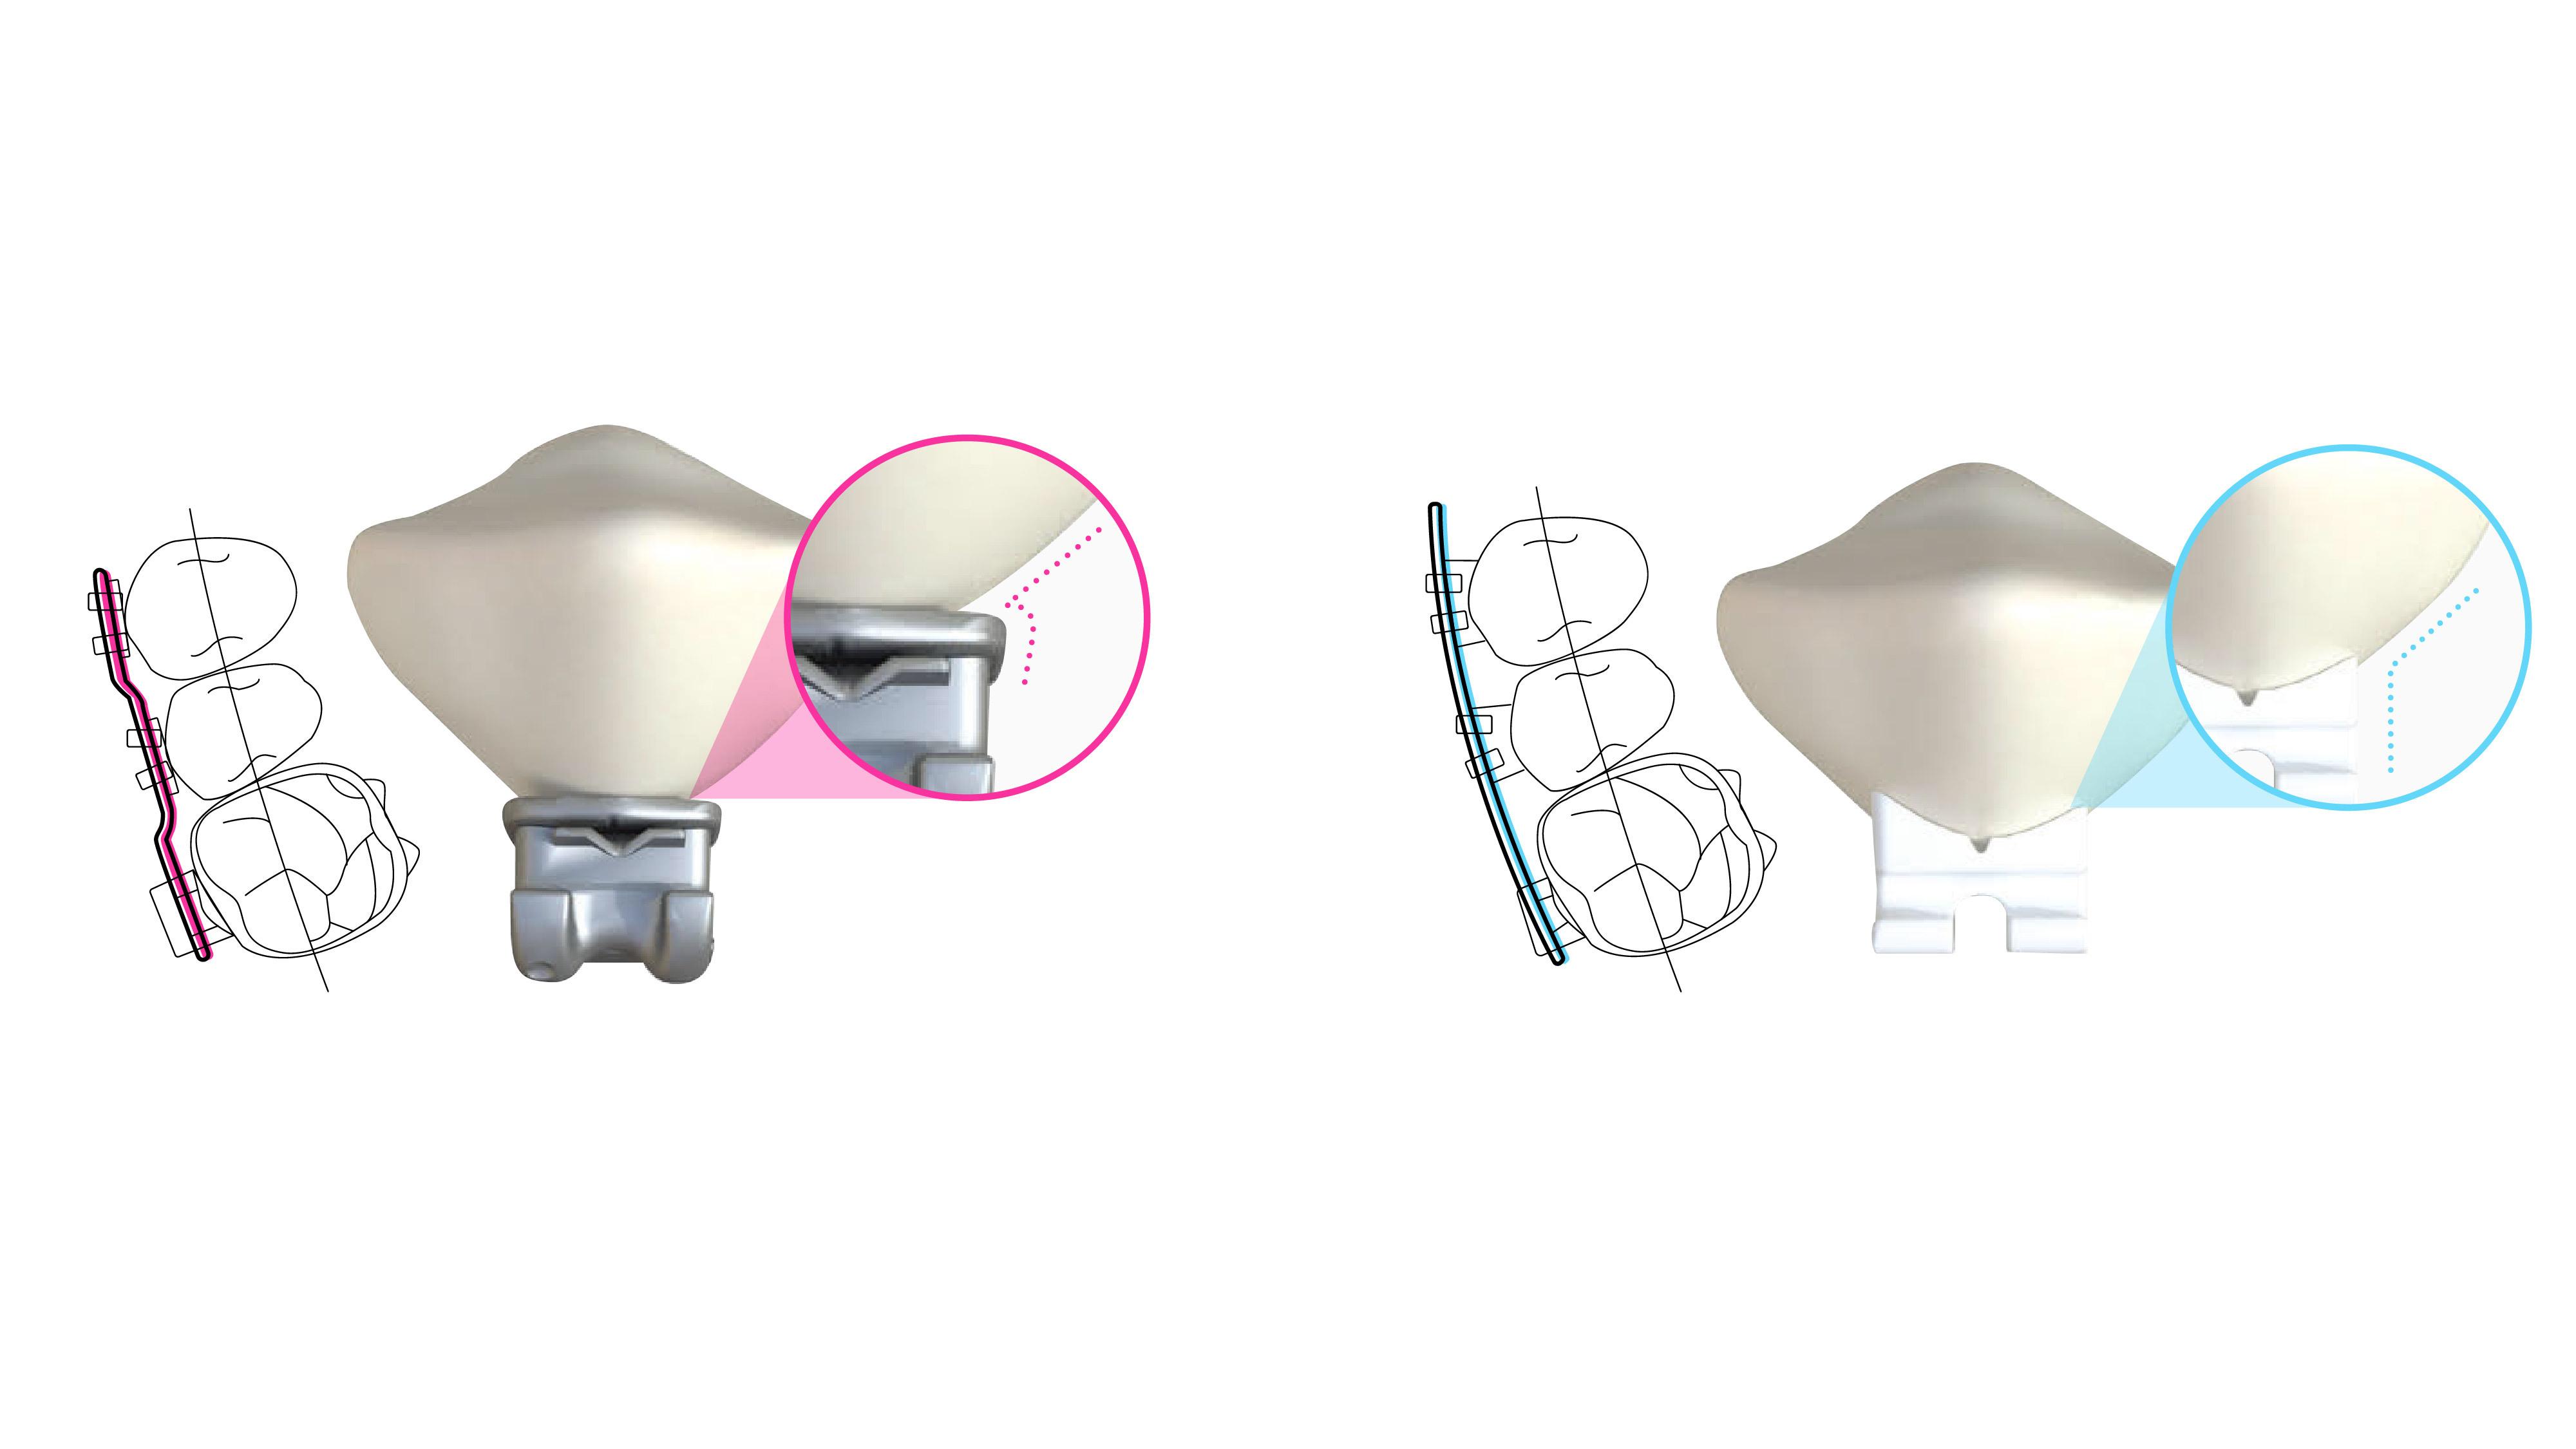 Traditional brackets (left) vs LightForce brackets (right). Image via LightForce.